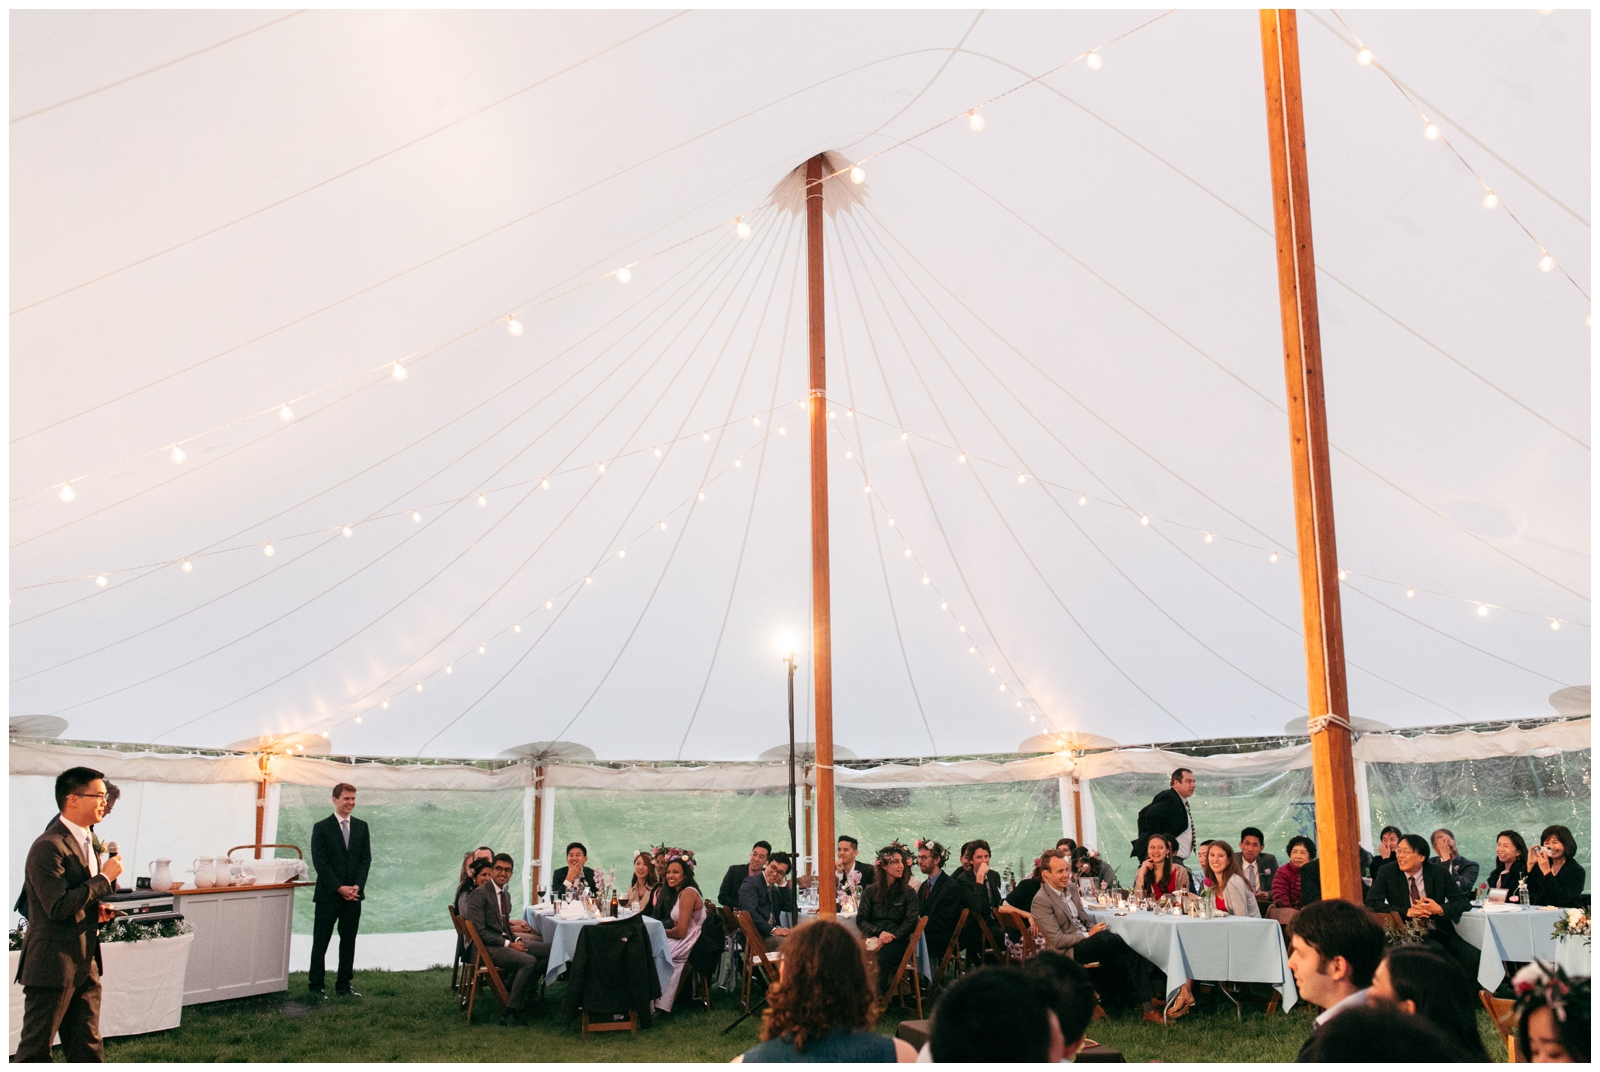 Massachusetts wedding venue with tent